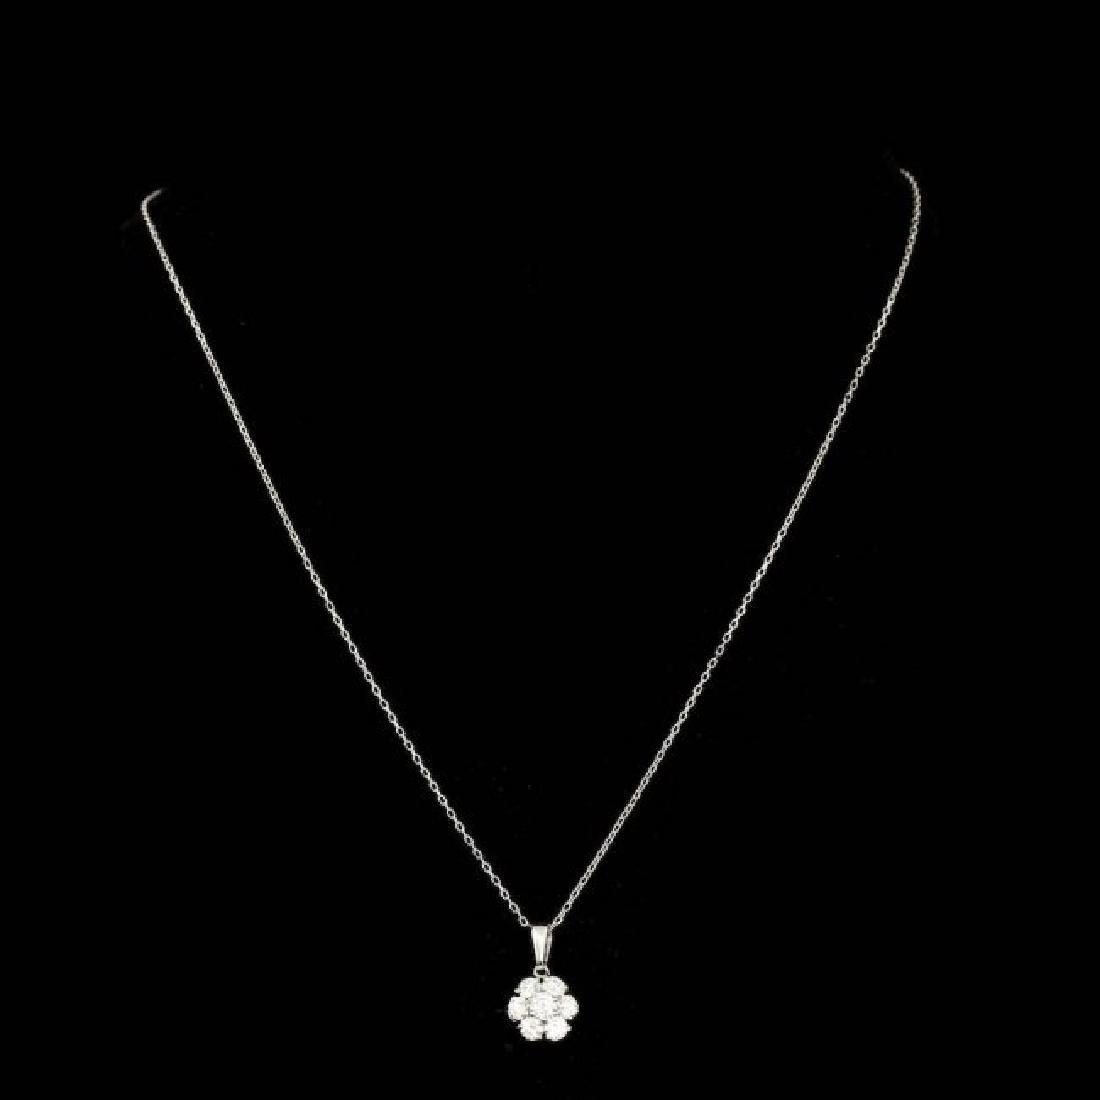 14k White Gold 0.90ct Diamond Pendant - 2